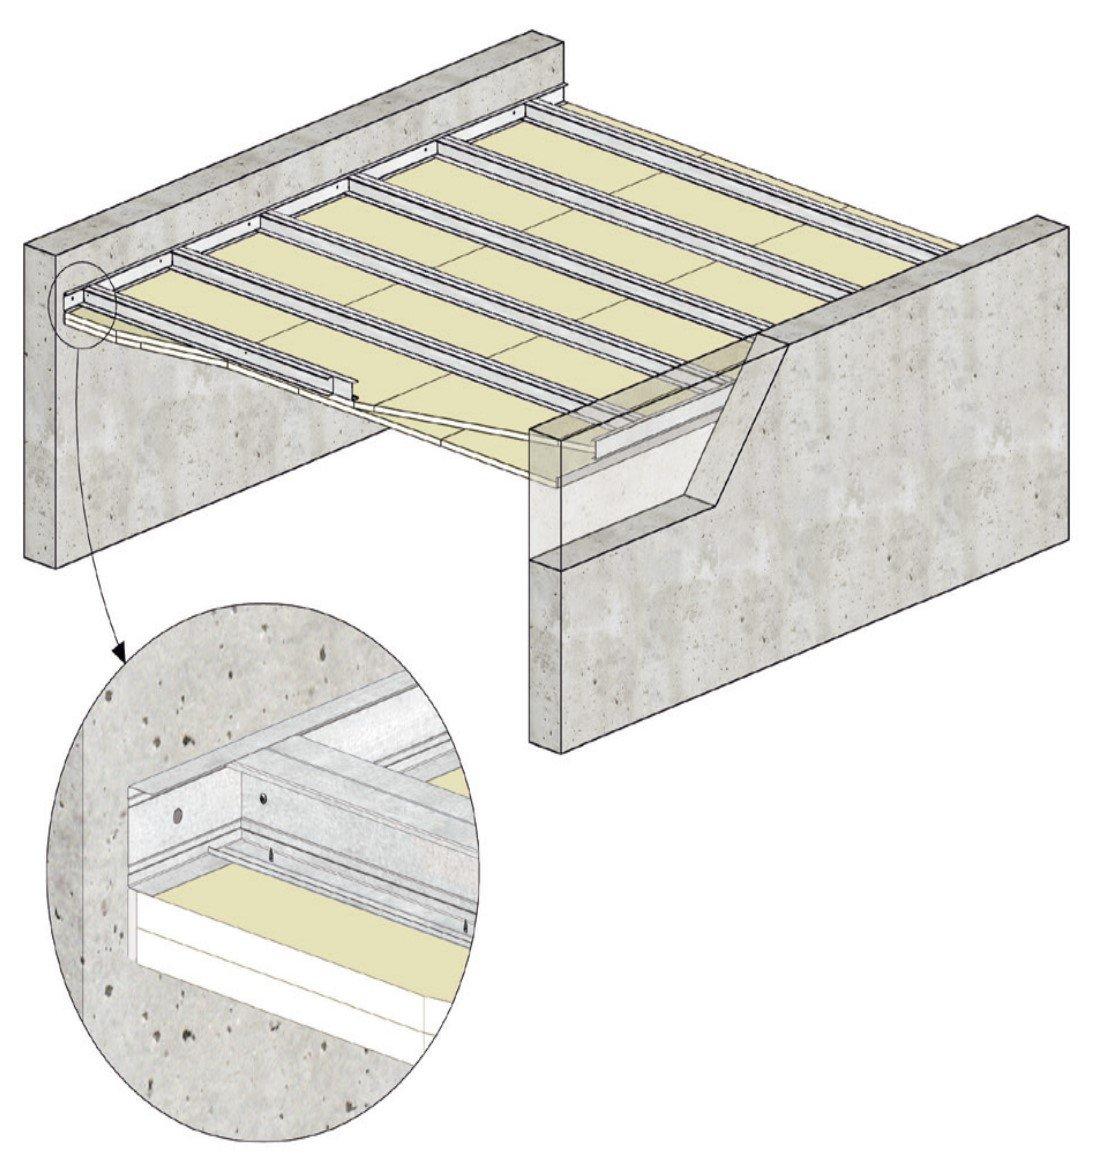 Plafond Knauf Métal - PLAFONDS SOUS CHARPENTE MÉTALLIQUE 2